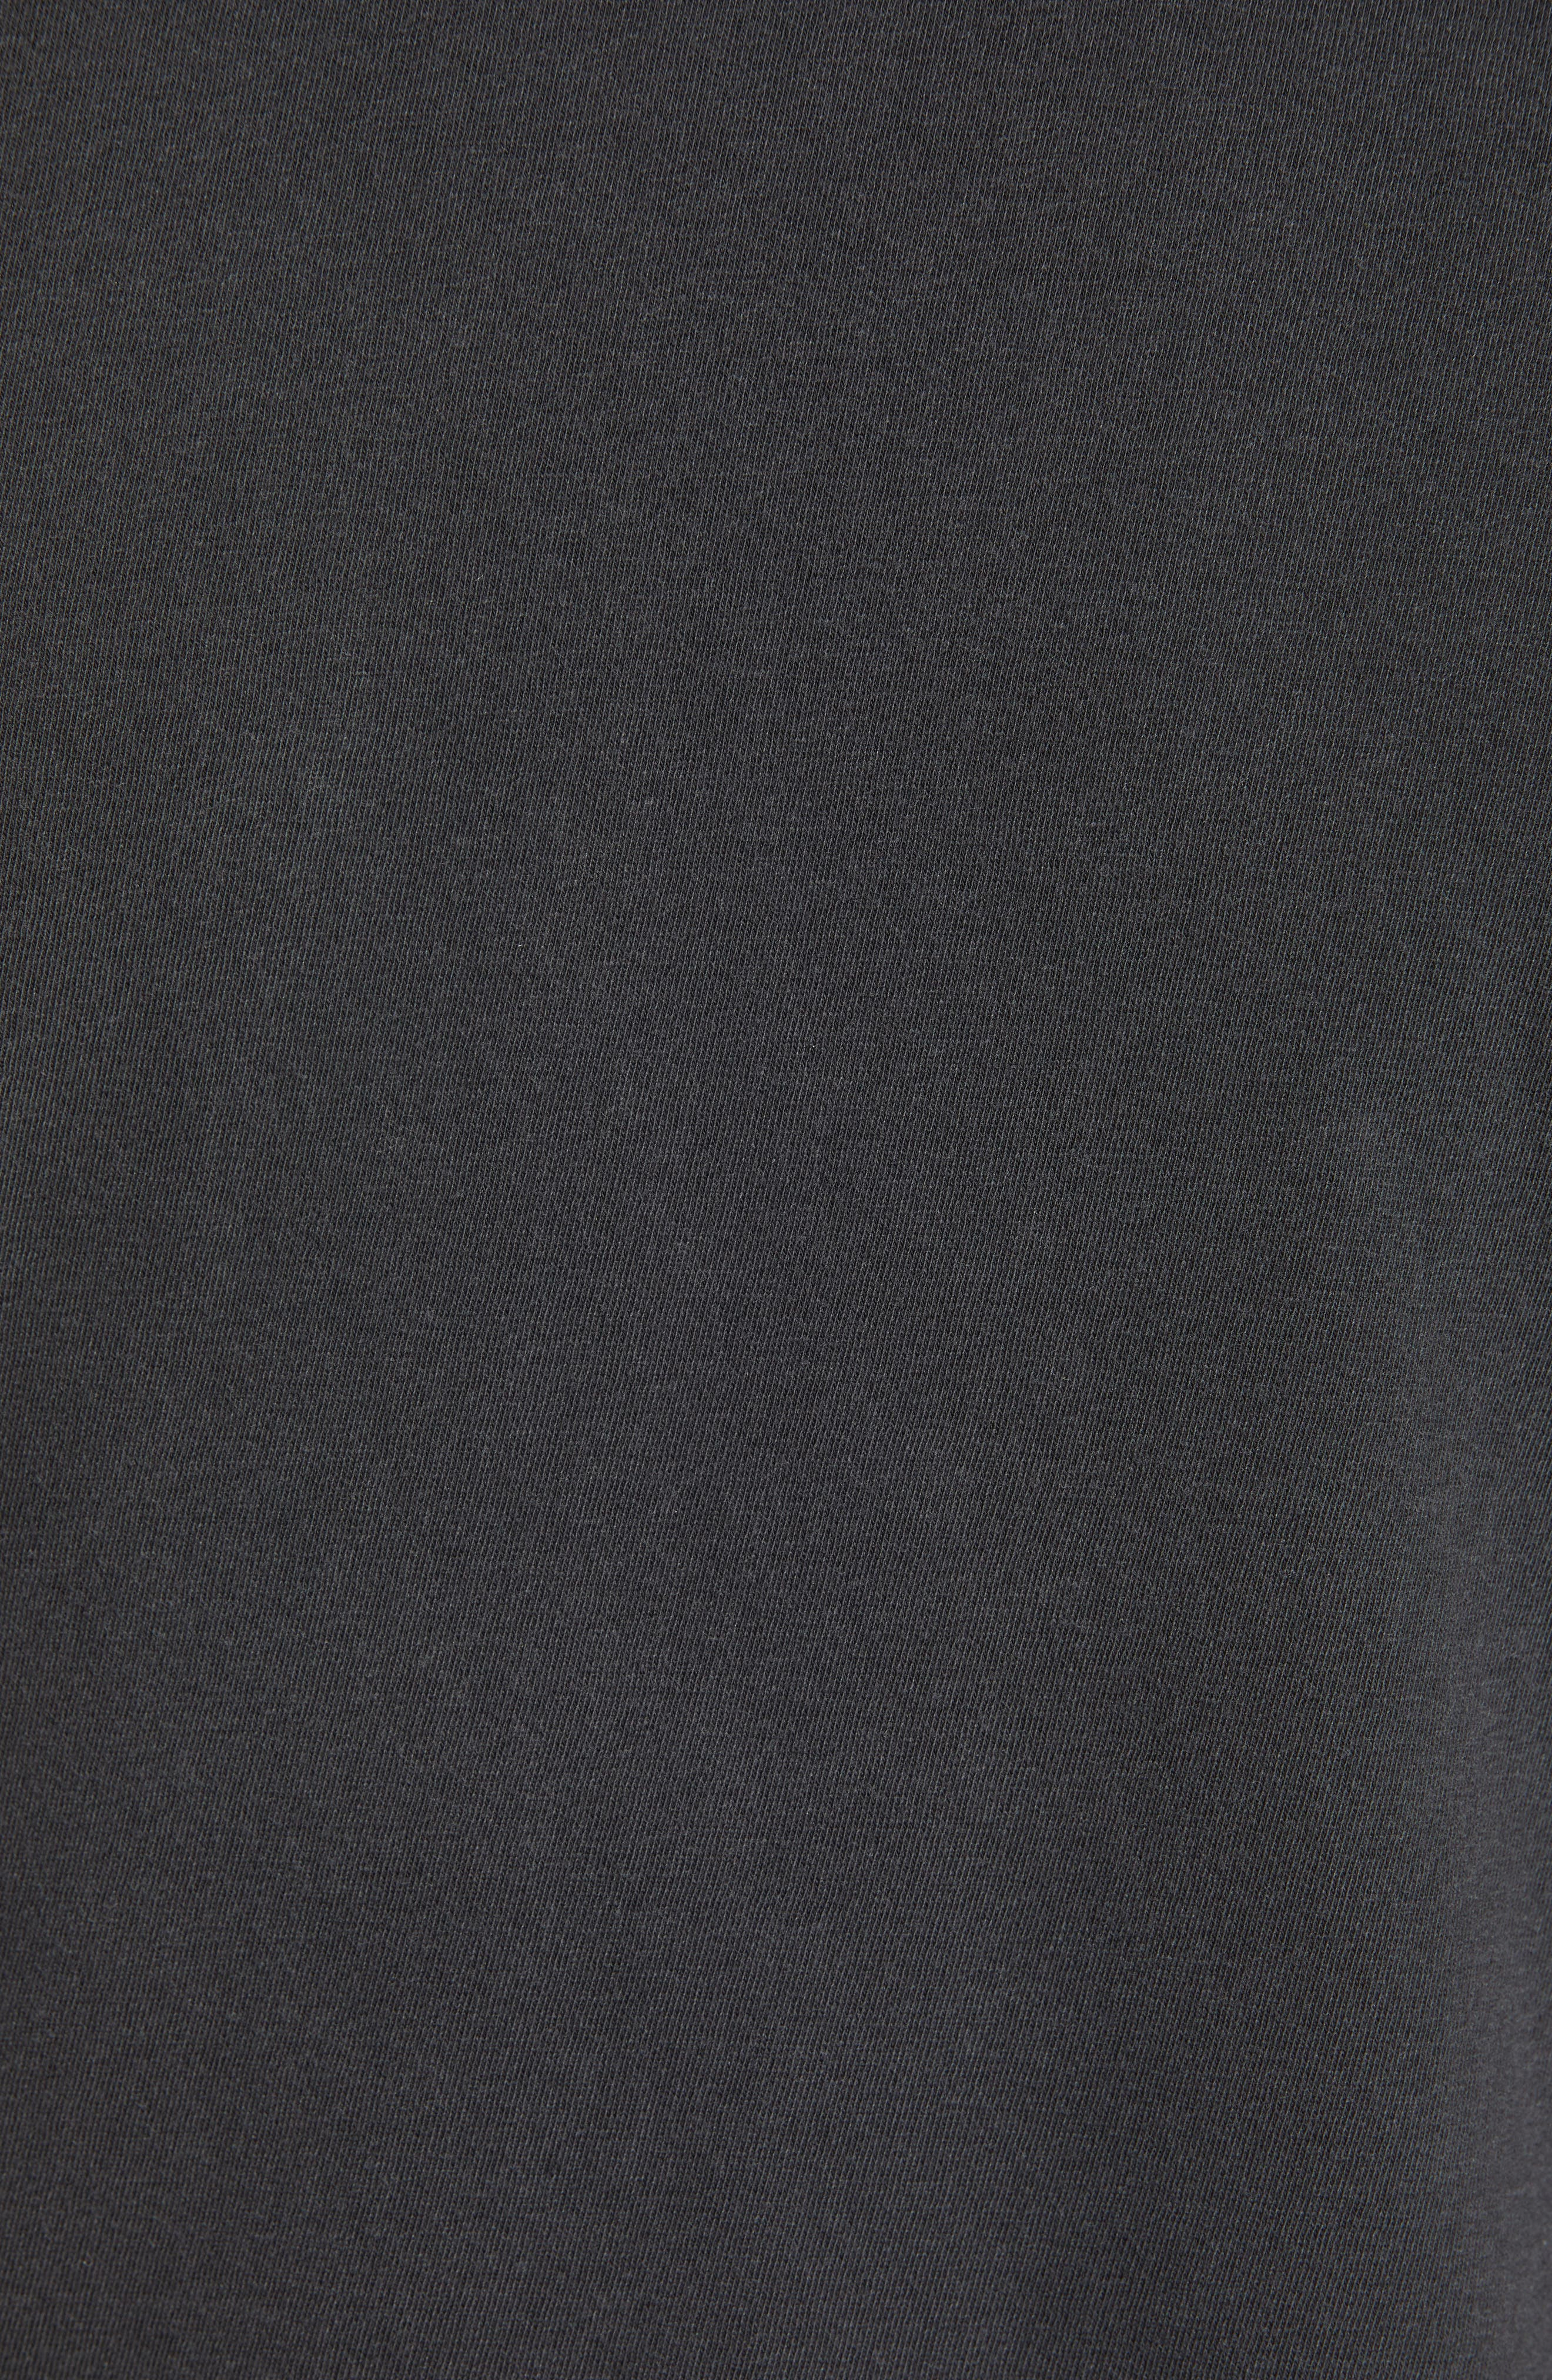 Regular Fit Tonal Palms Crewneck Shirt,                             Alternate thumbnail 5, color,                             CARBON PIGMENT